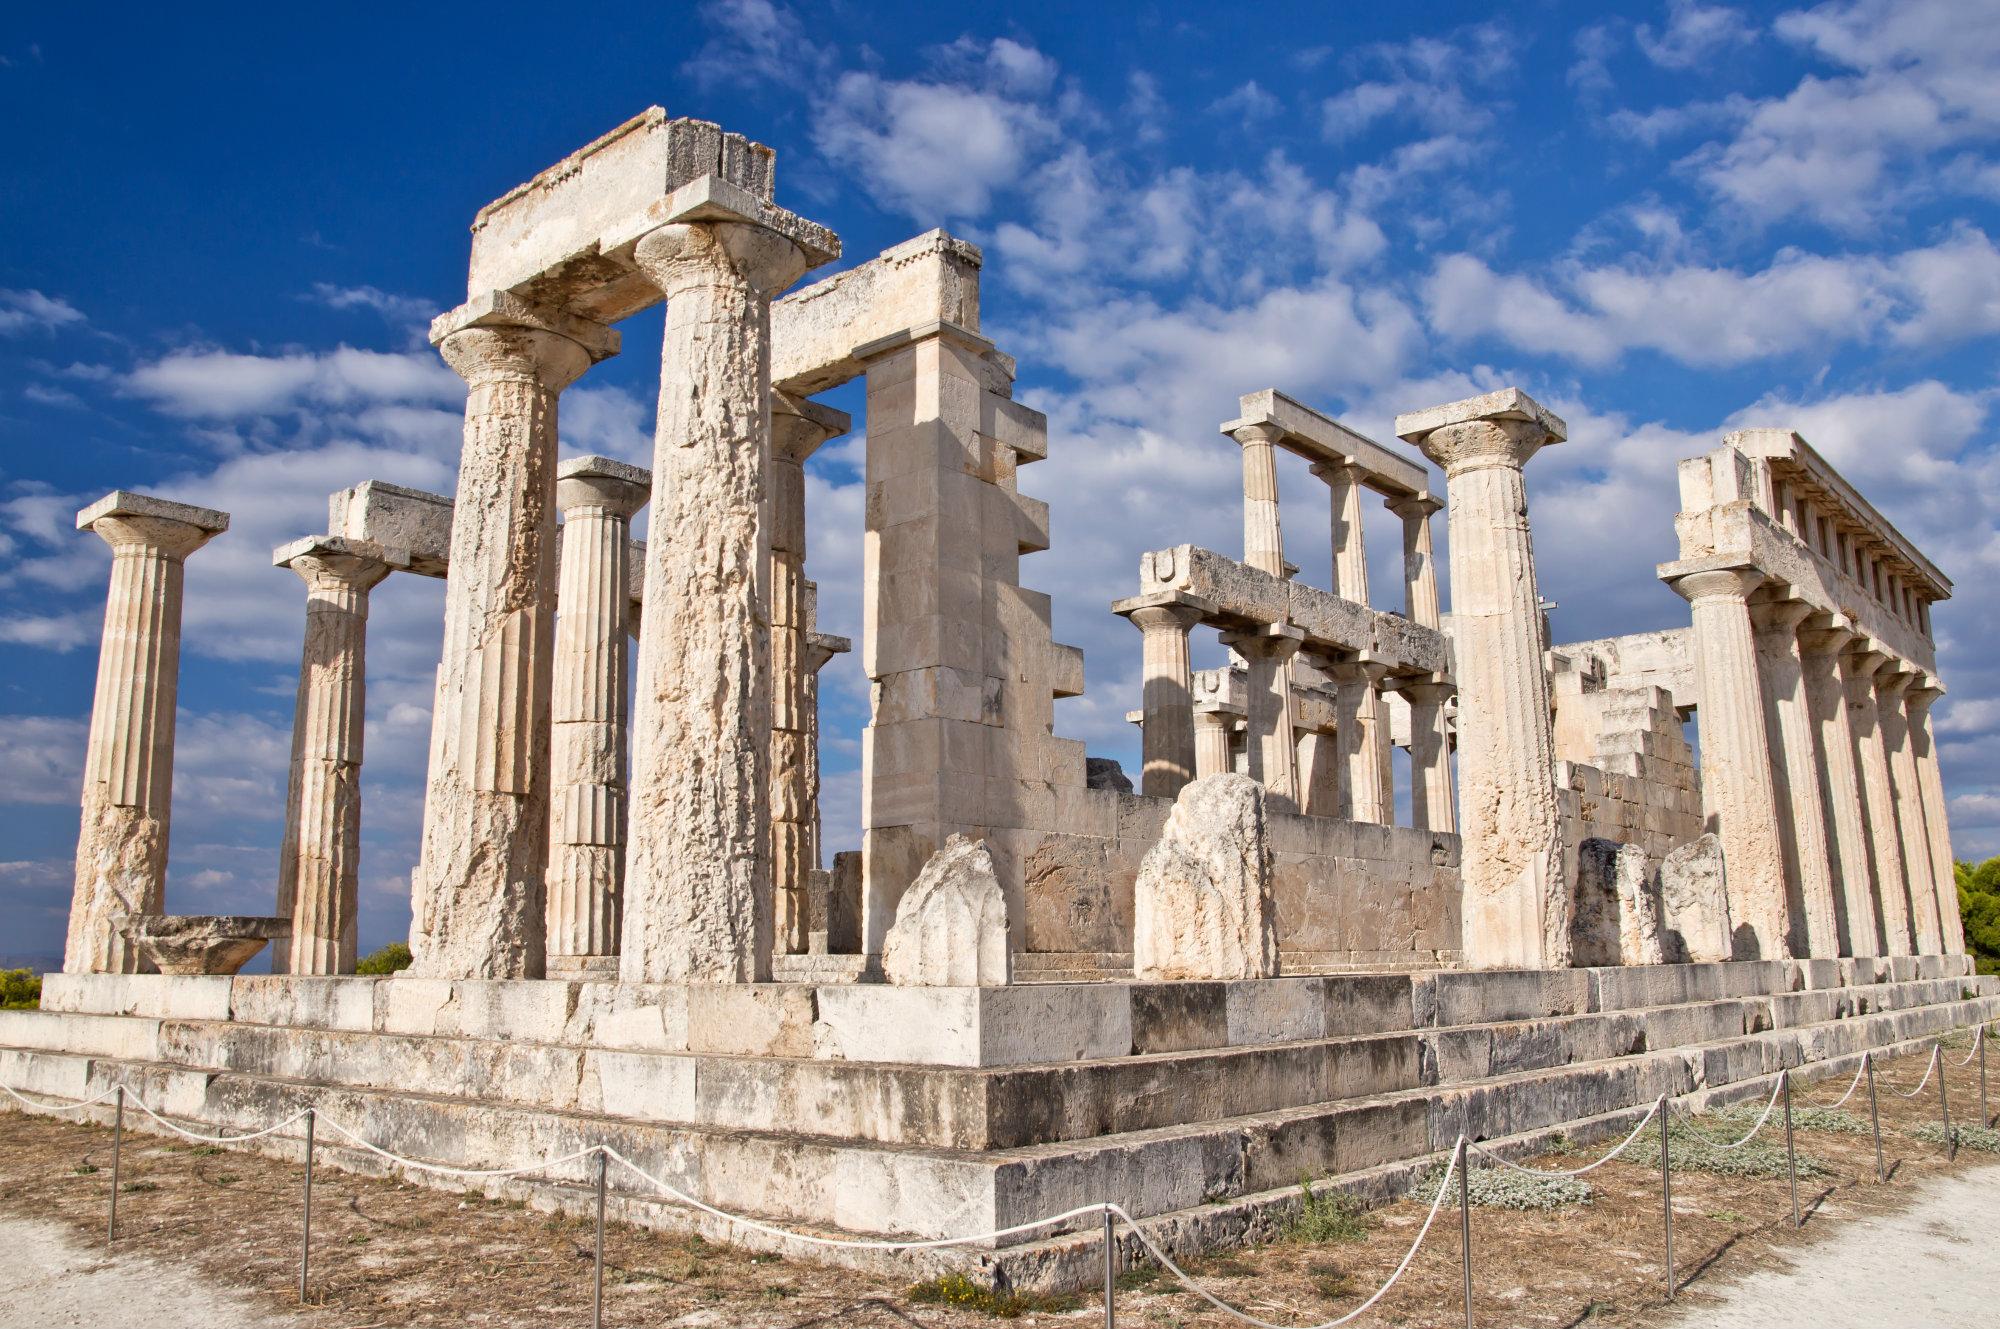 iStock-155641914_high Aegina Acrop.jpg